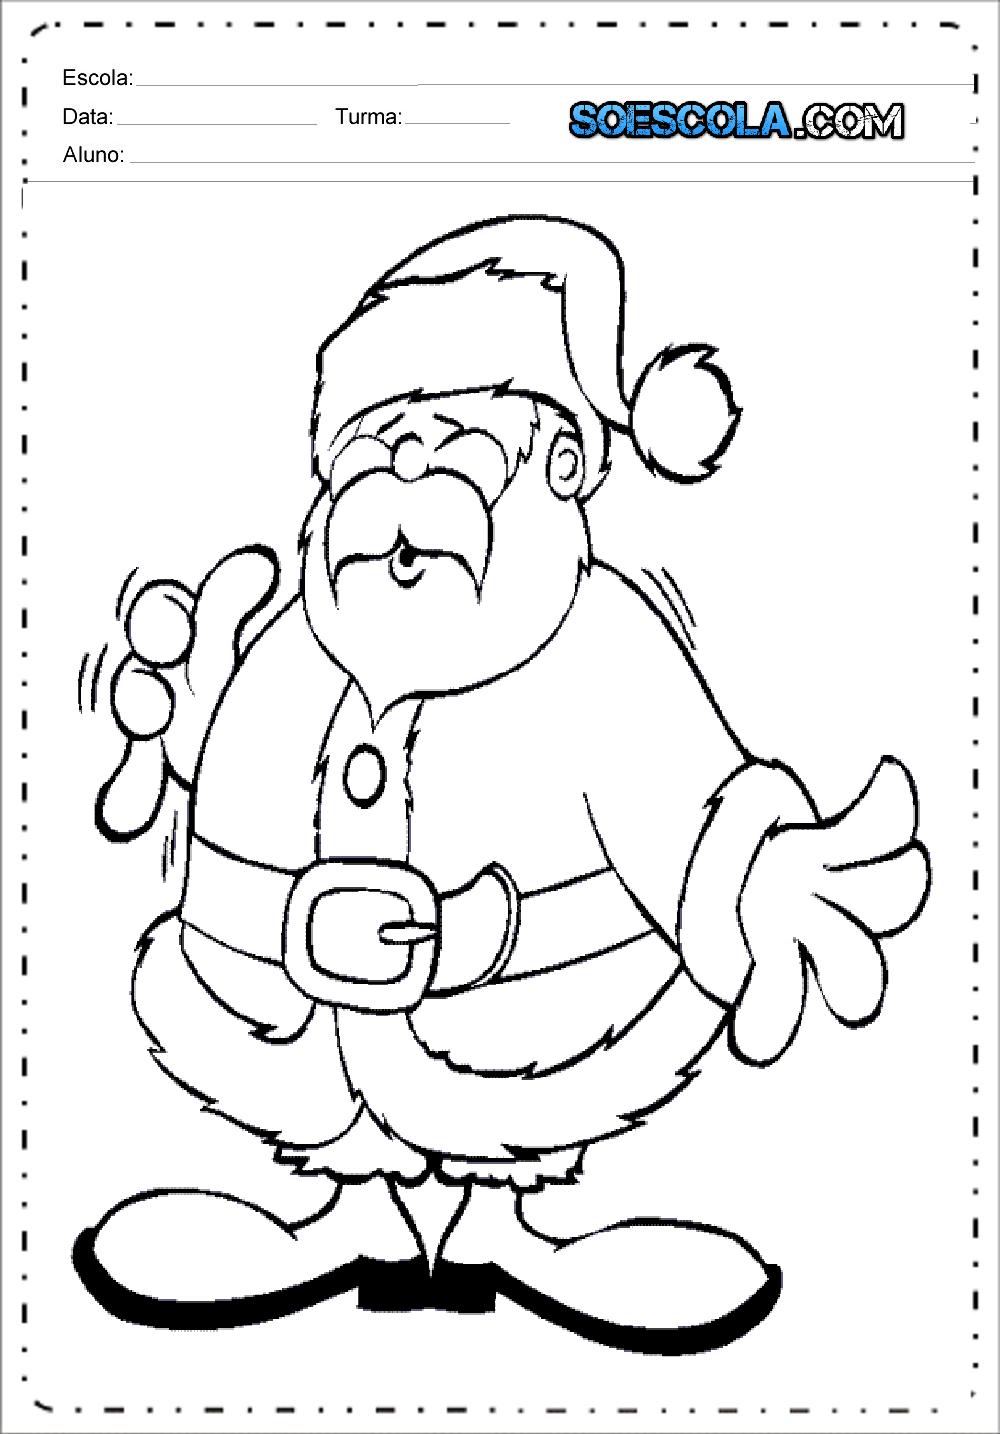 Desenhos de Papai Noel para Colorir e Imprimir - Desenhos de Natal.